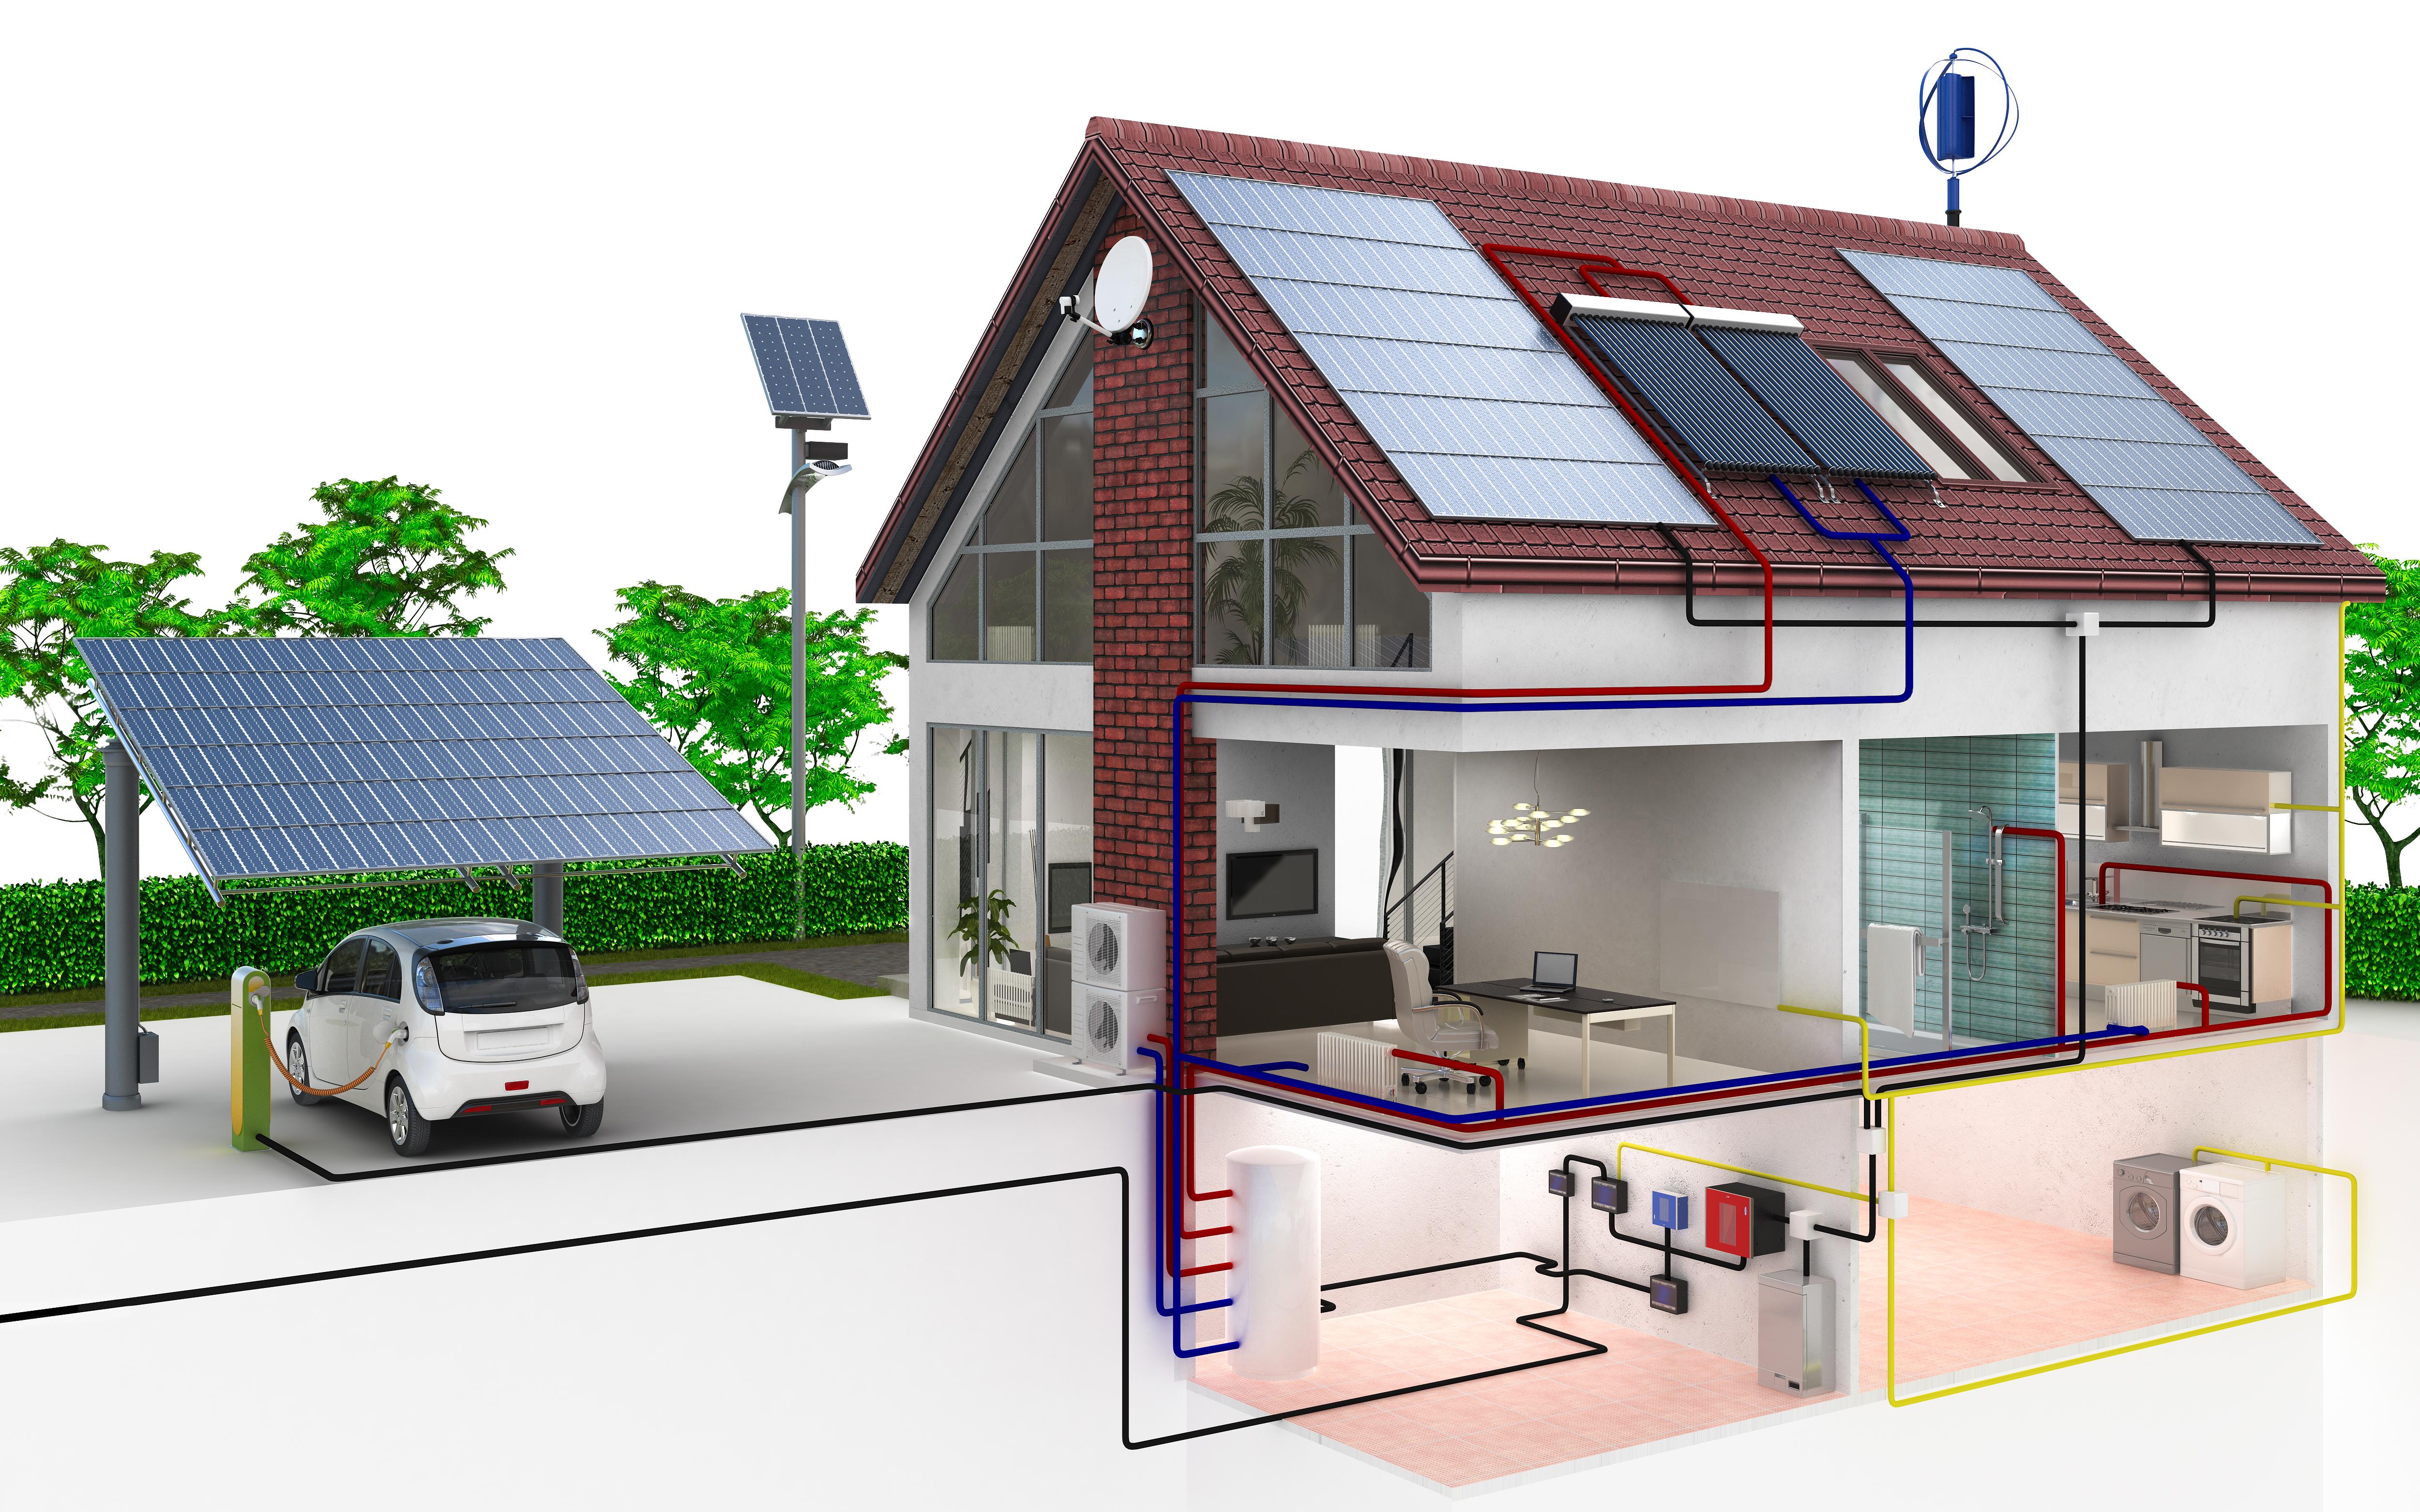 Family house energy supply